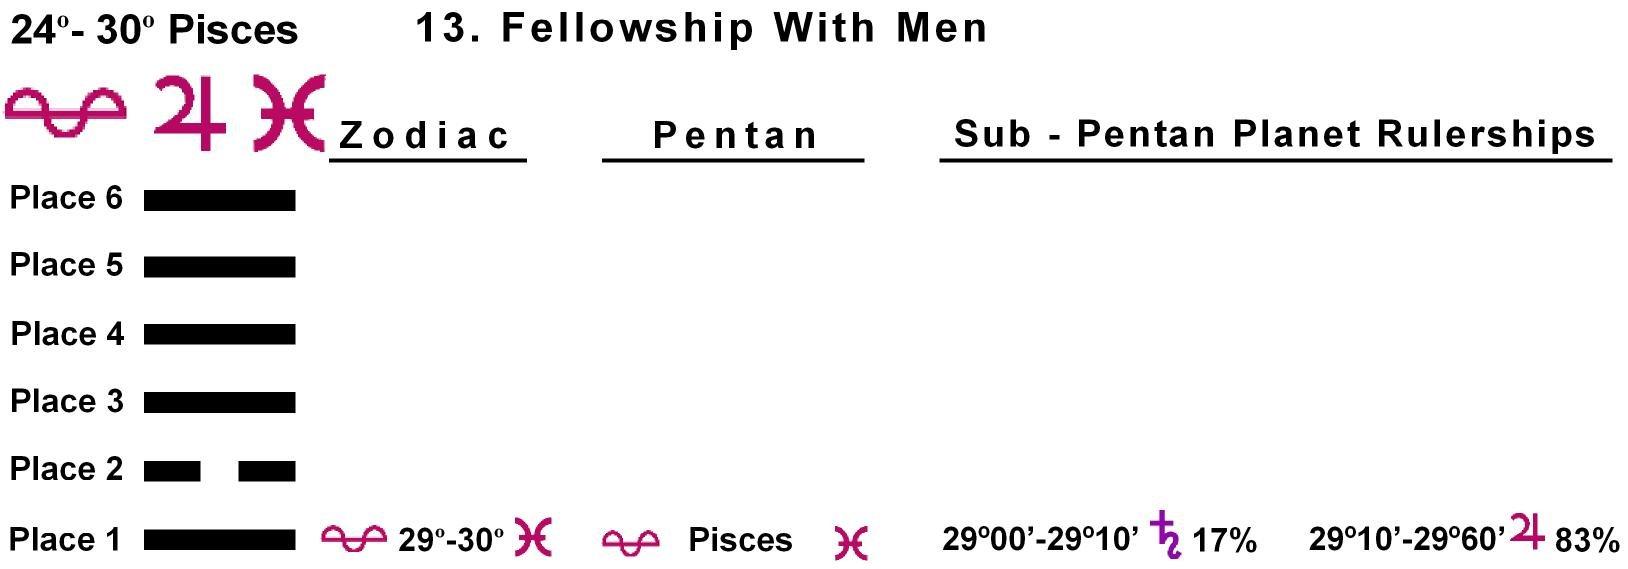 Pent-lines-12PI 29-30 Hx-13 Fellowship With Men